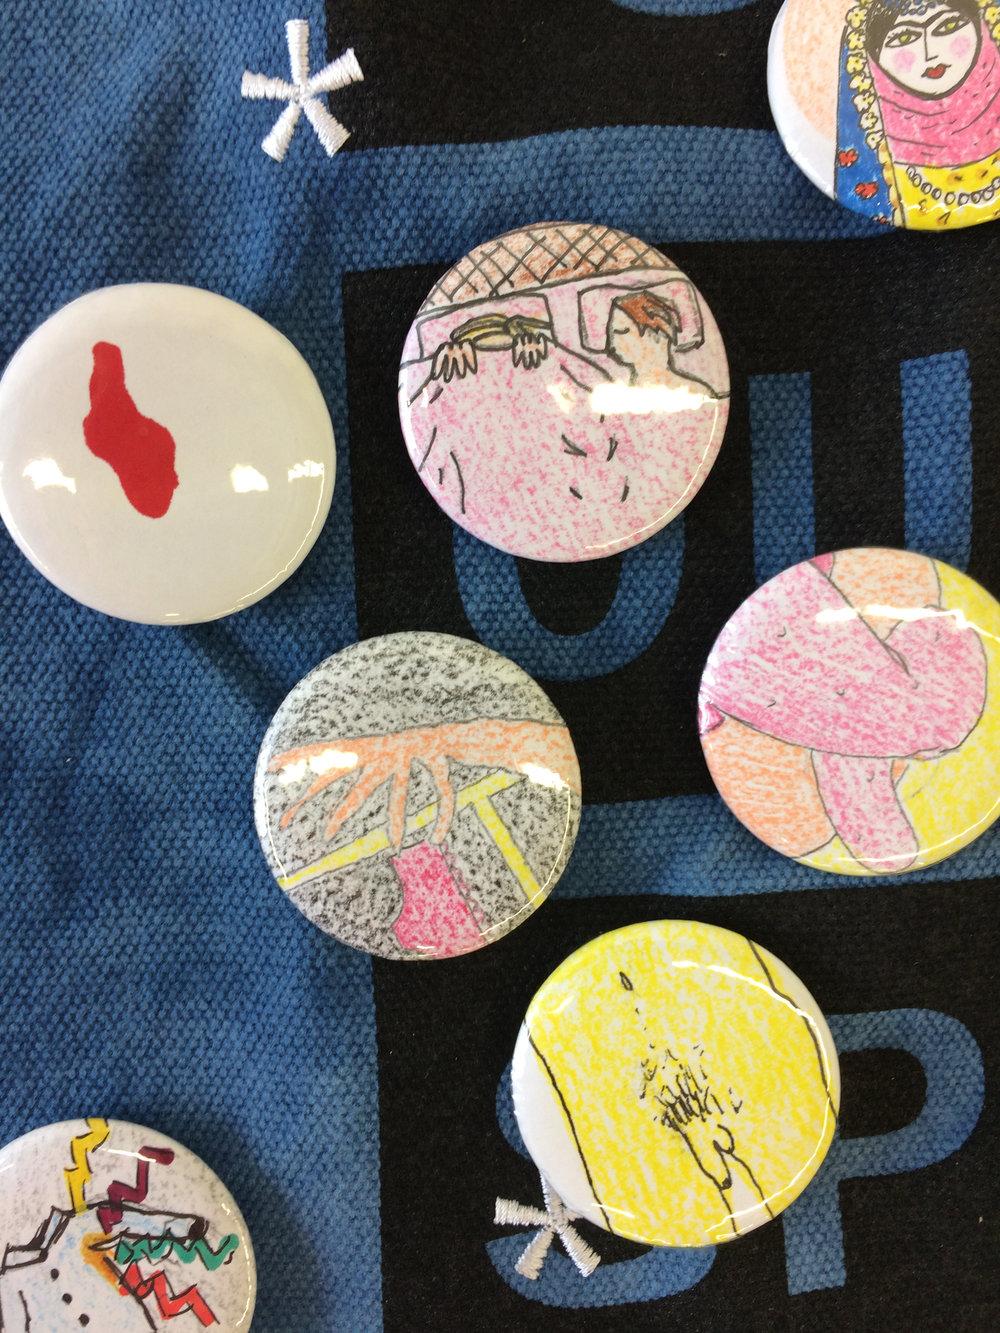 Badges by Tom Aird, Llewellyn Millhouse, Bahar SH and Sarah Thomson.